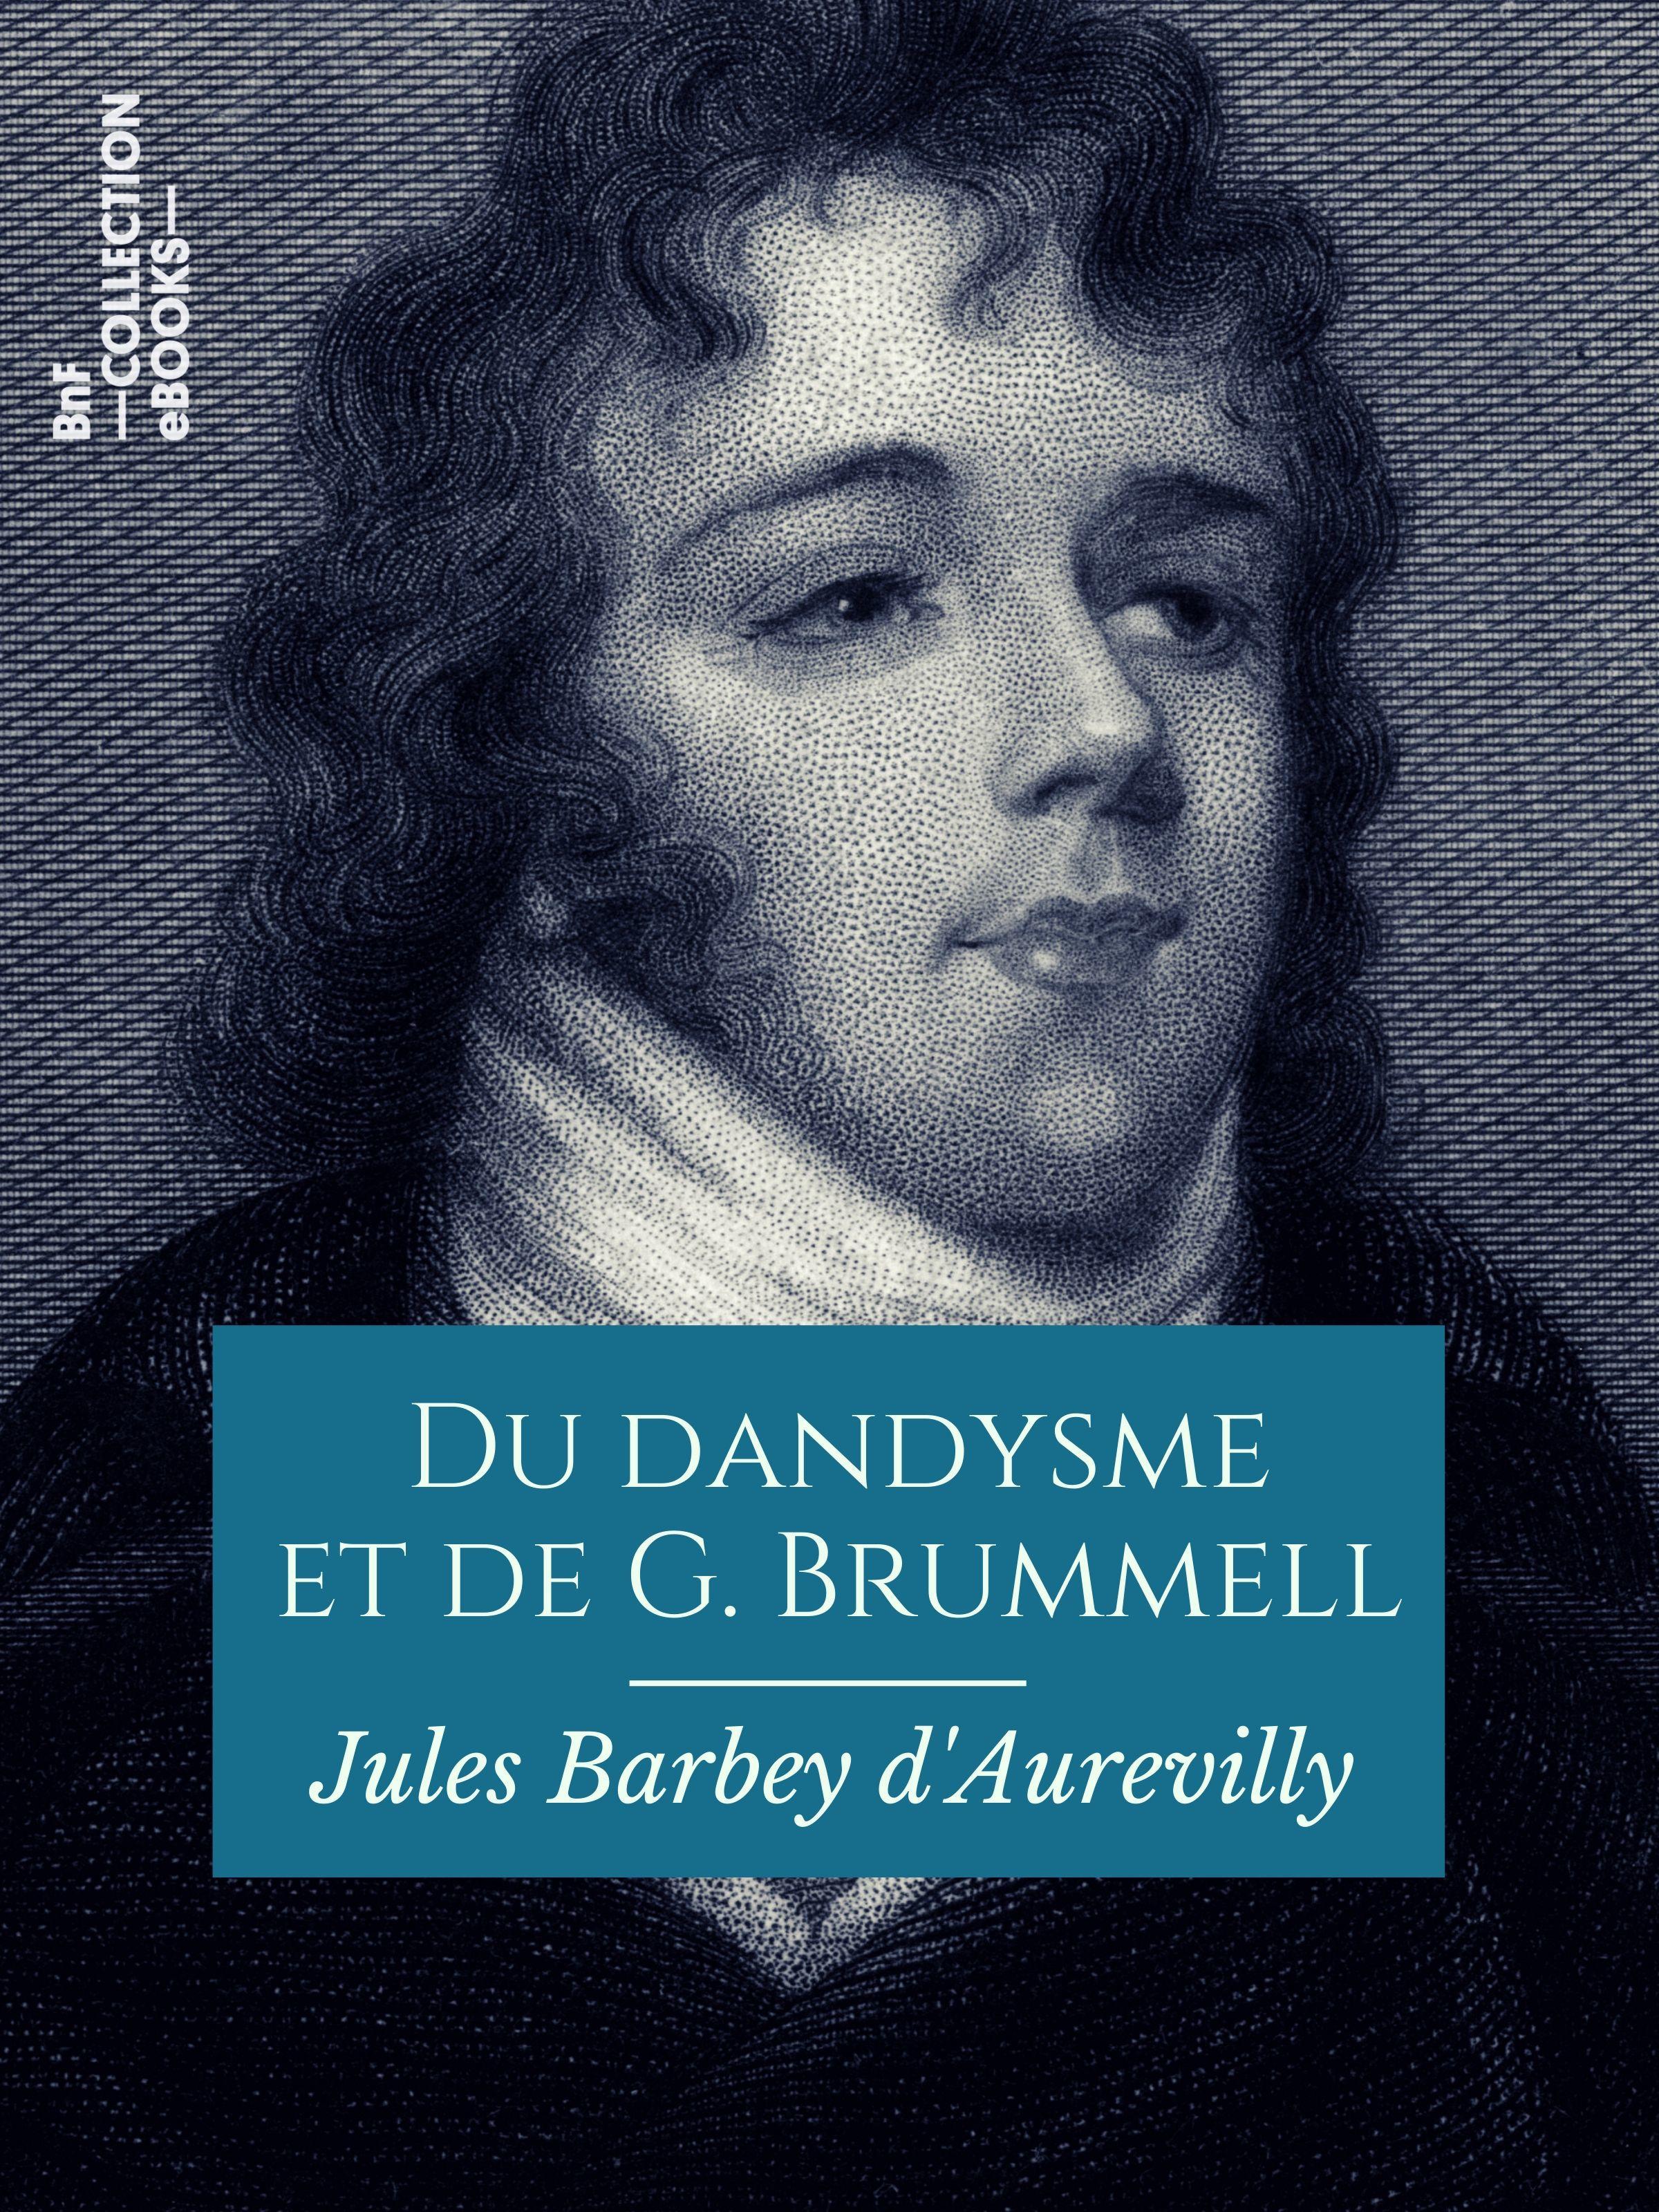 Du dandysme et de G. Brummell  - Jules Barbey d'Aurevilly (1808-1889)